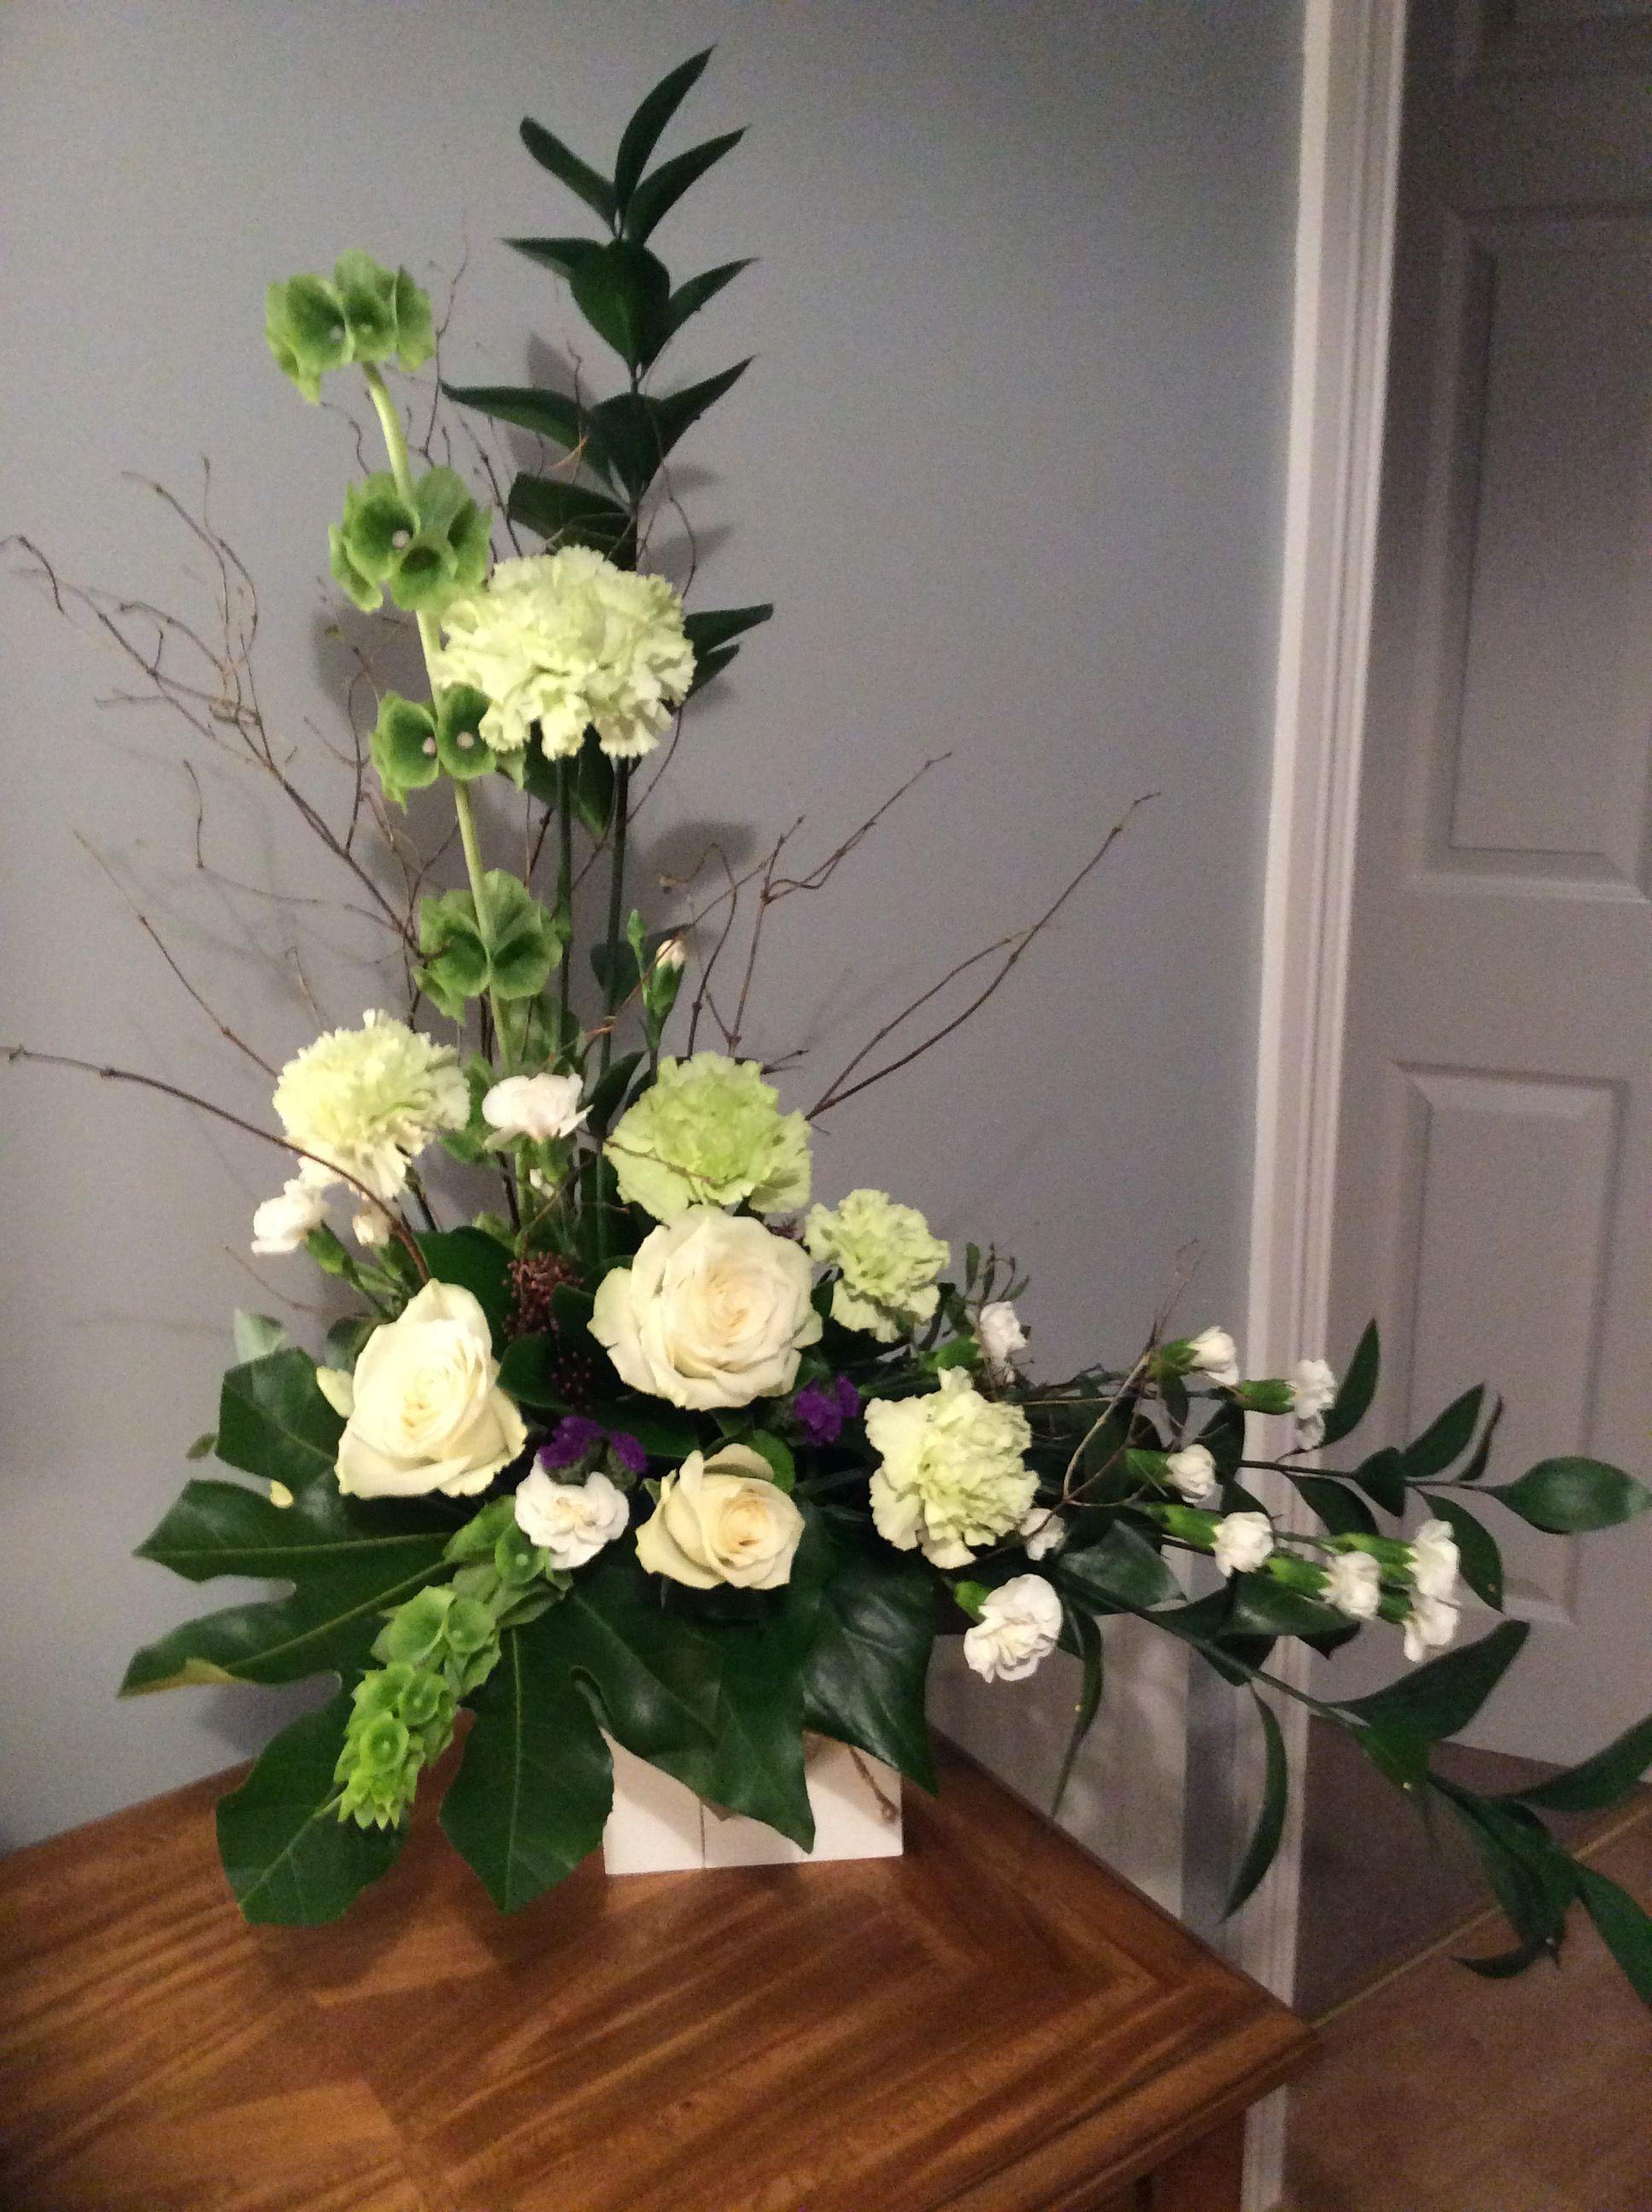 Asymmetrical With Carnations And Roses Church Flower Arrangements Modern Flower Arrangements Floral Arrangements